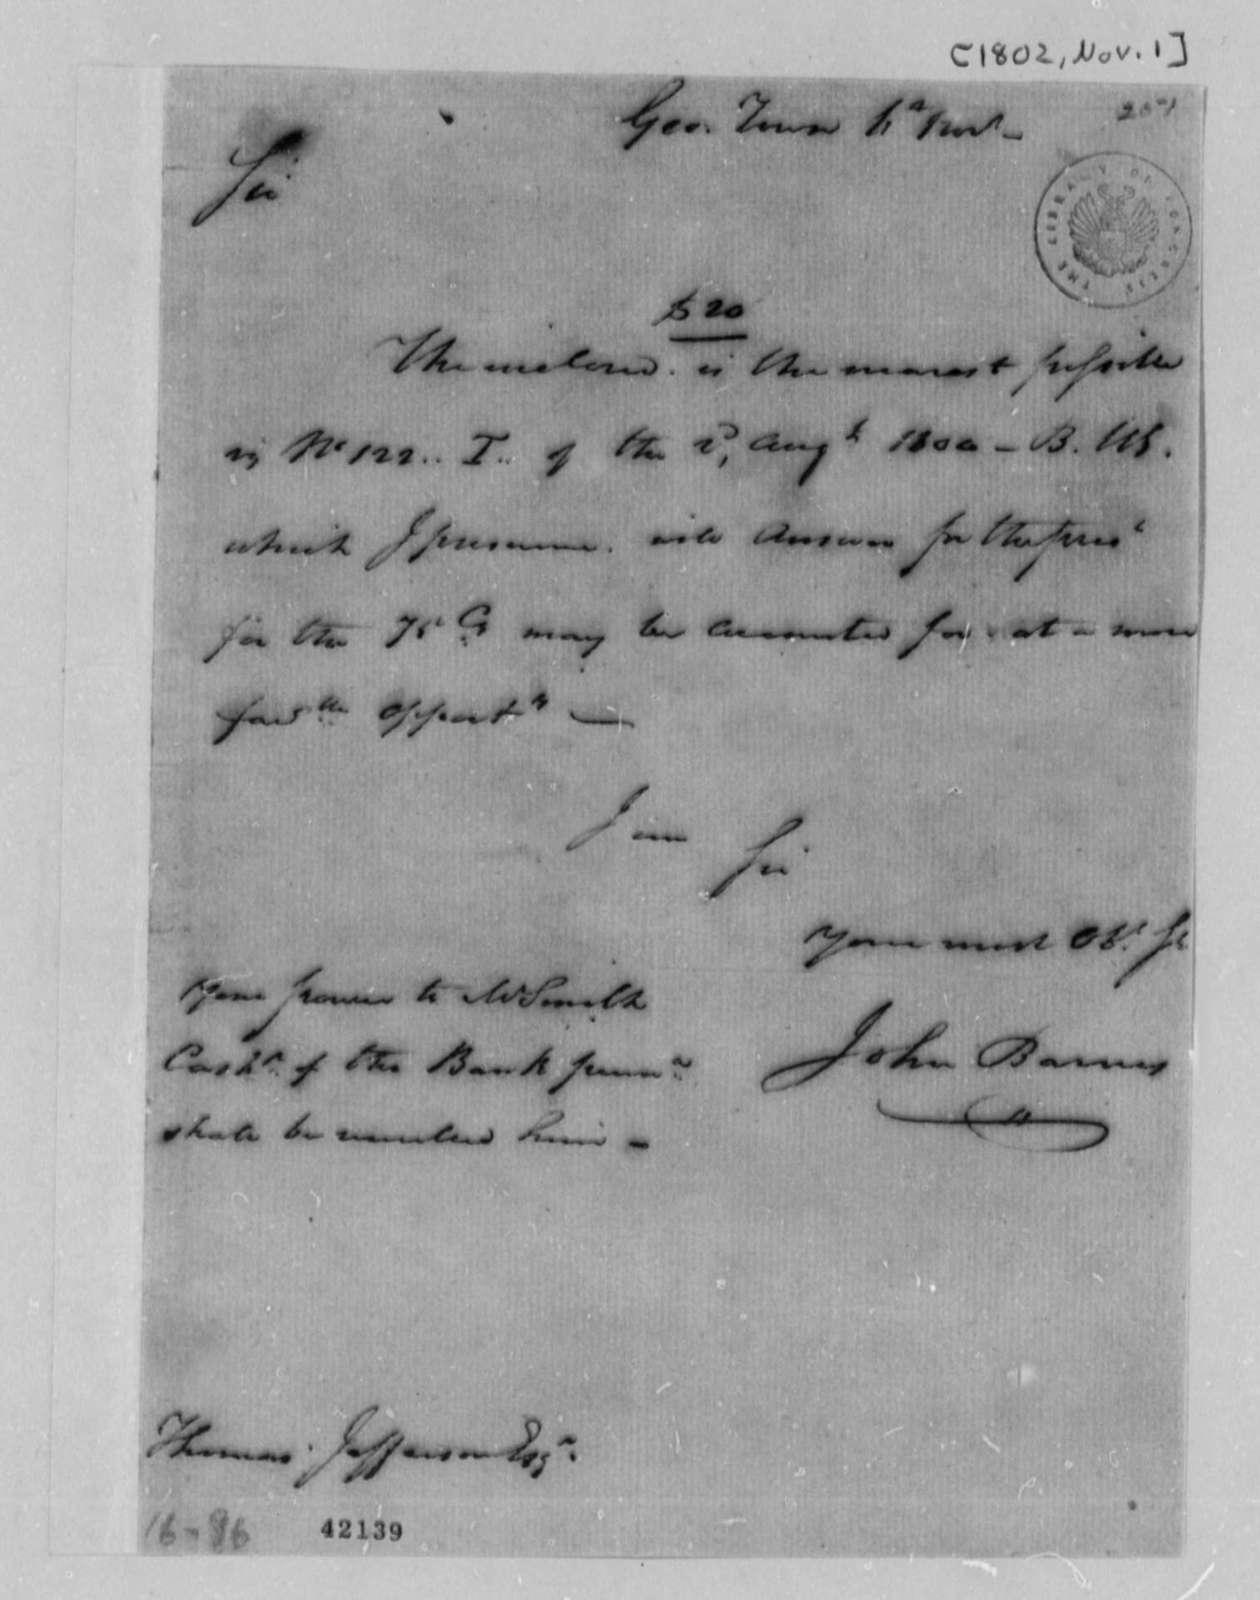 John S. Barnes to Thomas Jefferson, November 1, 1802